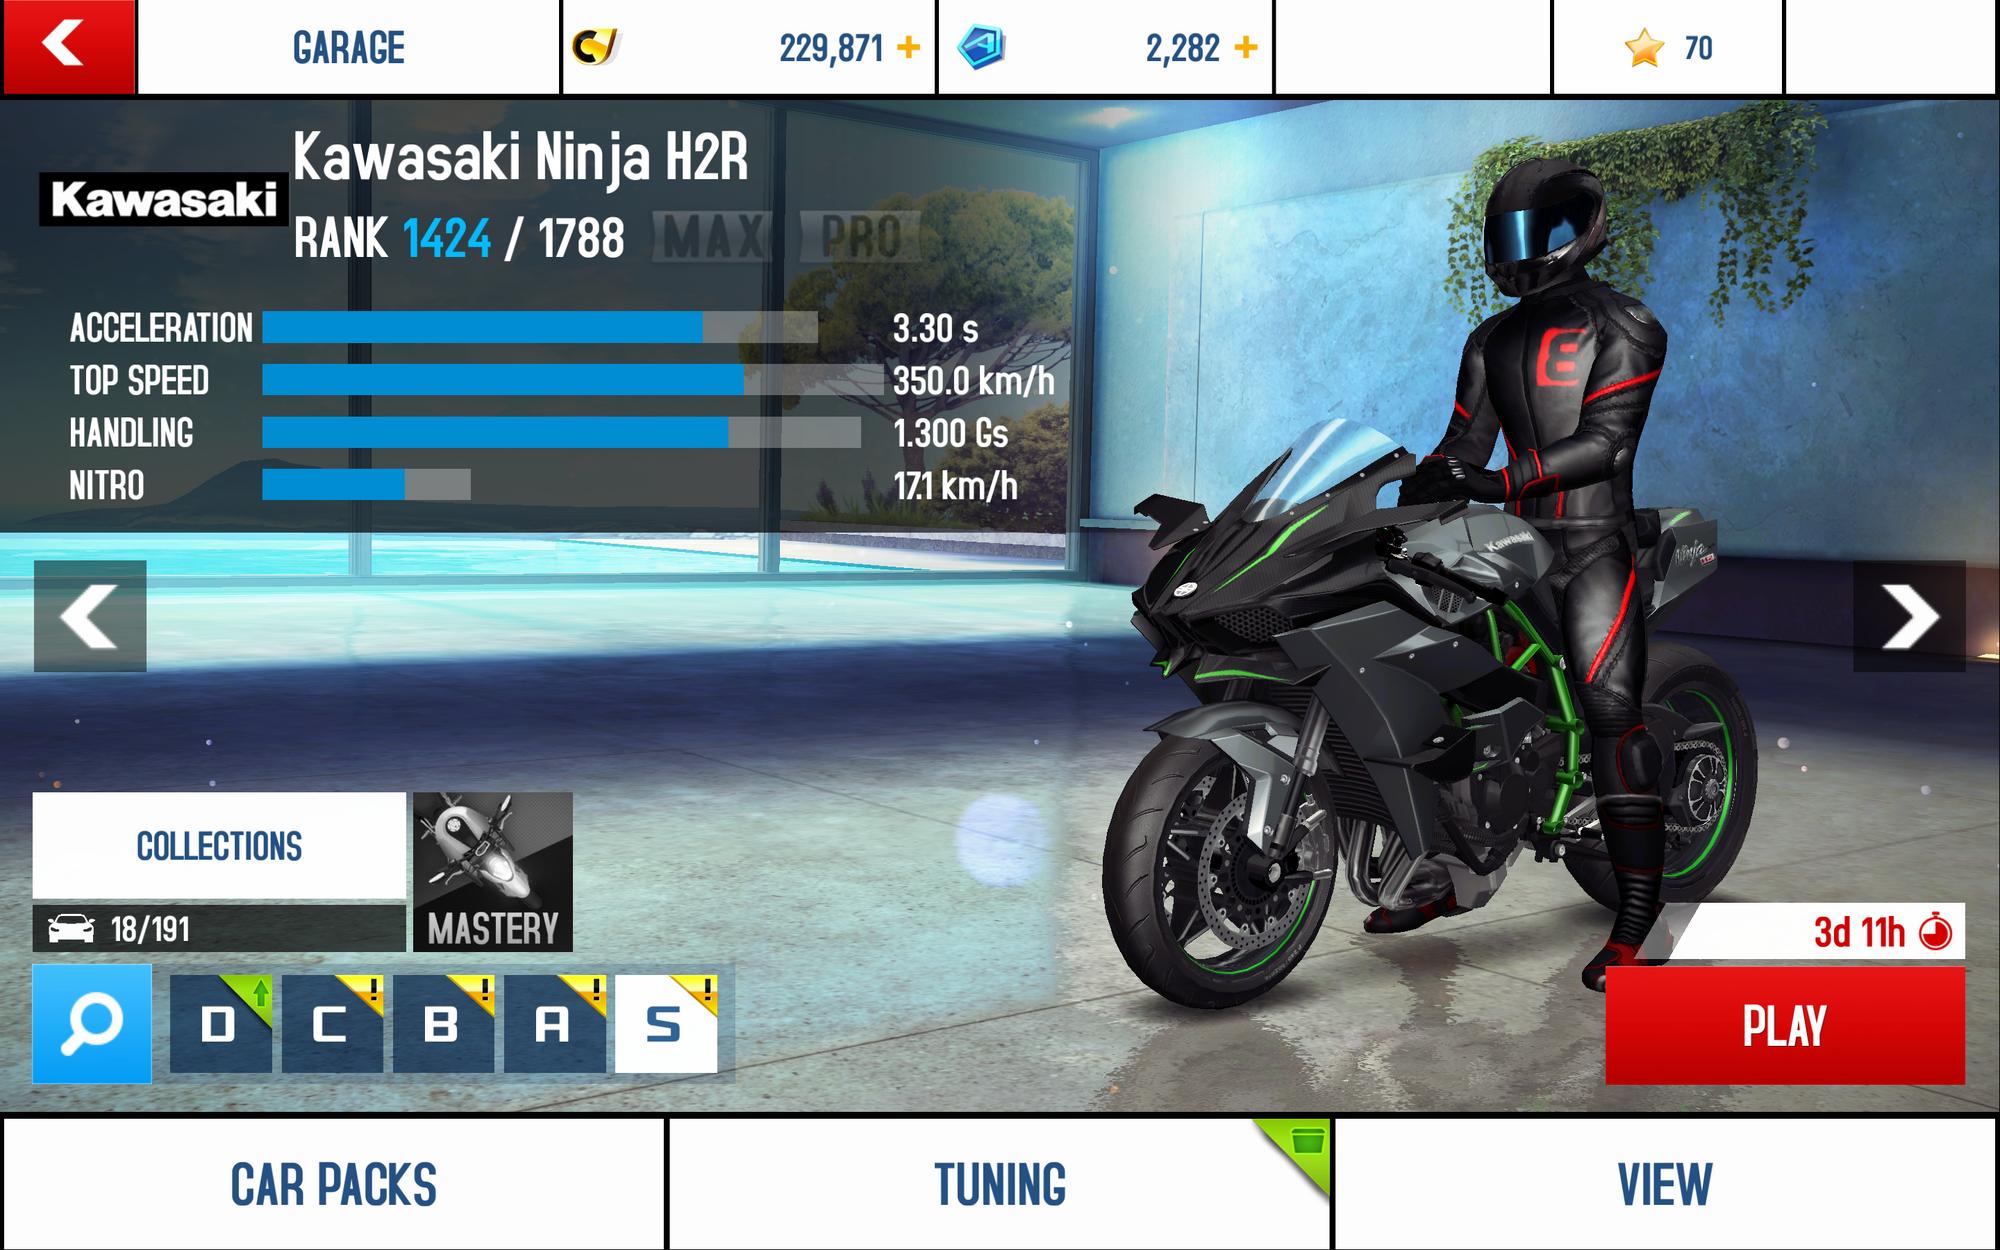 Kawasaki Ninja H2r Asphalt Wiki Fandom Powered By Wikia